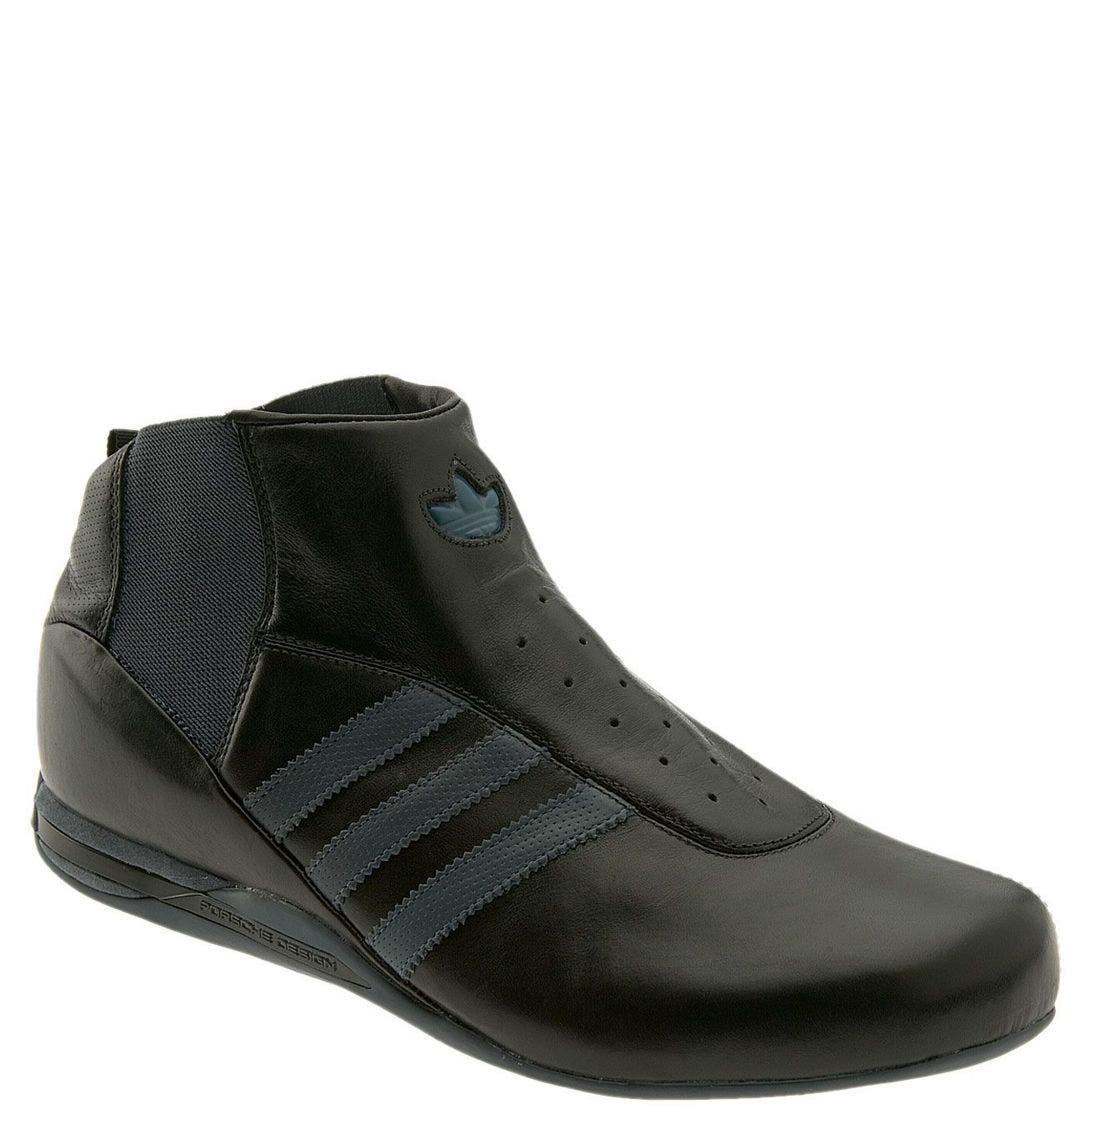 c12f372d097bc ... usa adidas porsche design cl mid sneaker men nordstrom 631f8 39b66